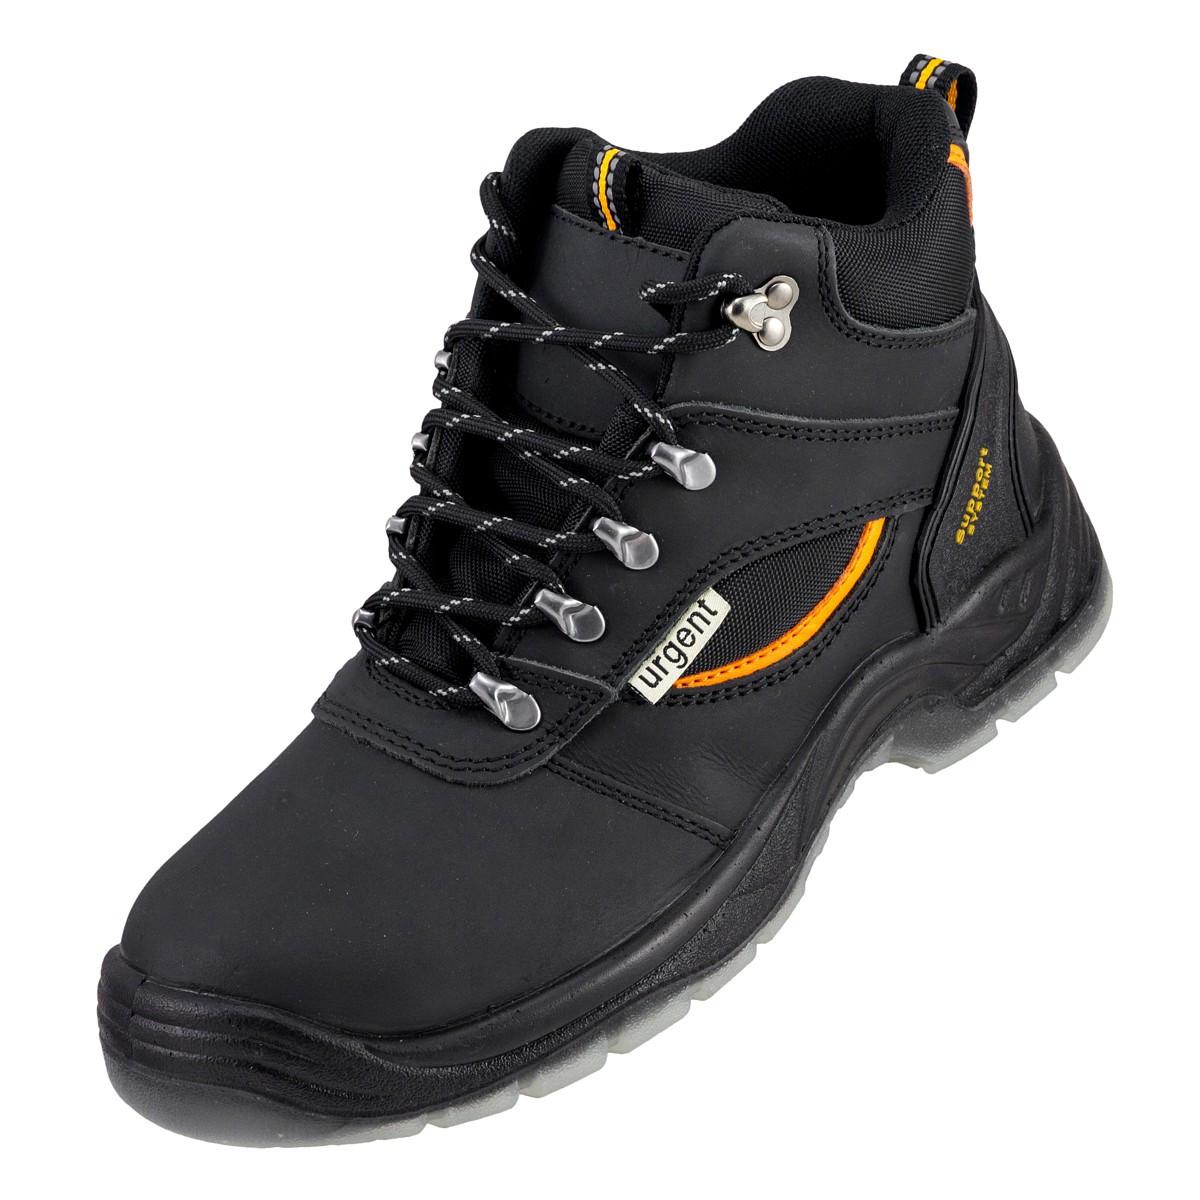 Ботинки 126 S1  с металлическим носком,антистатические. Urgent